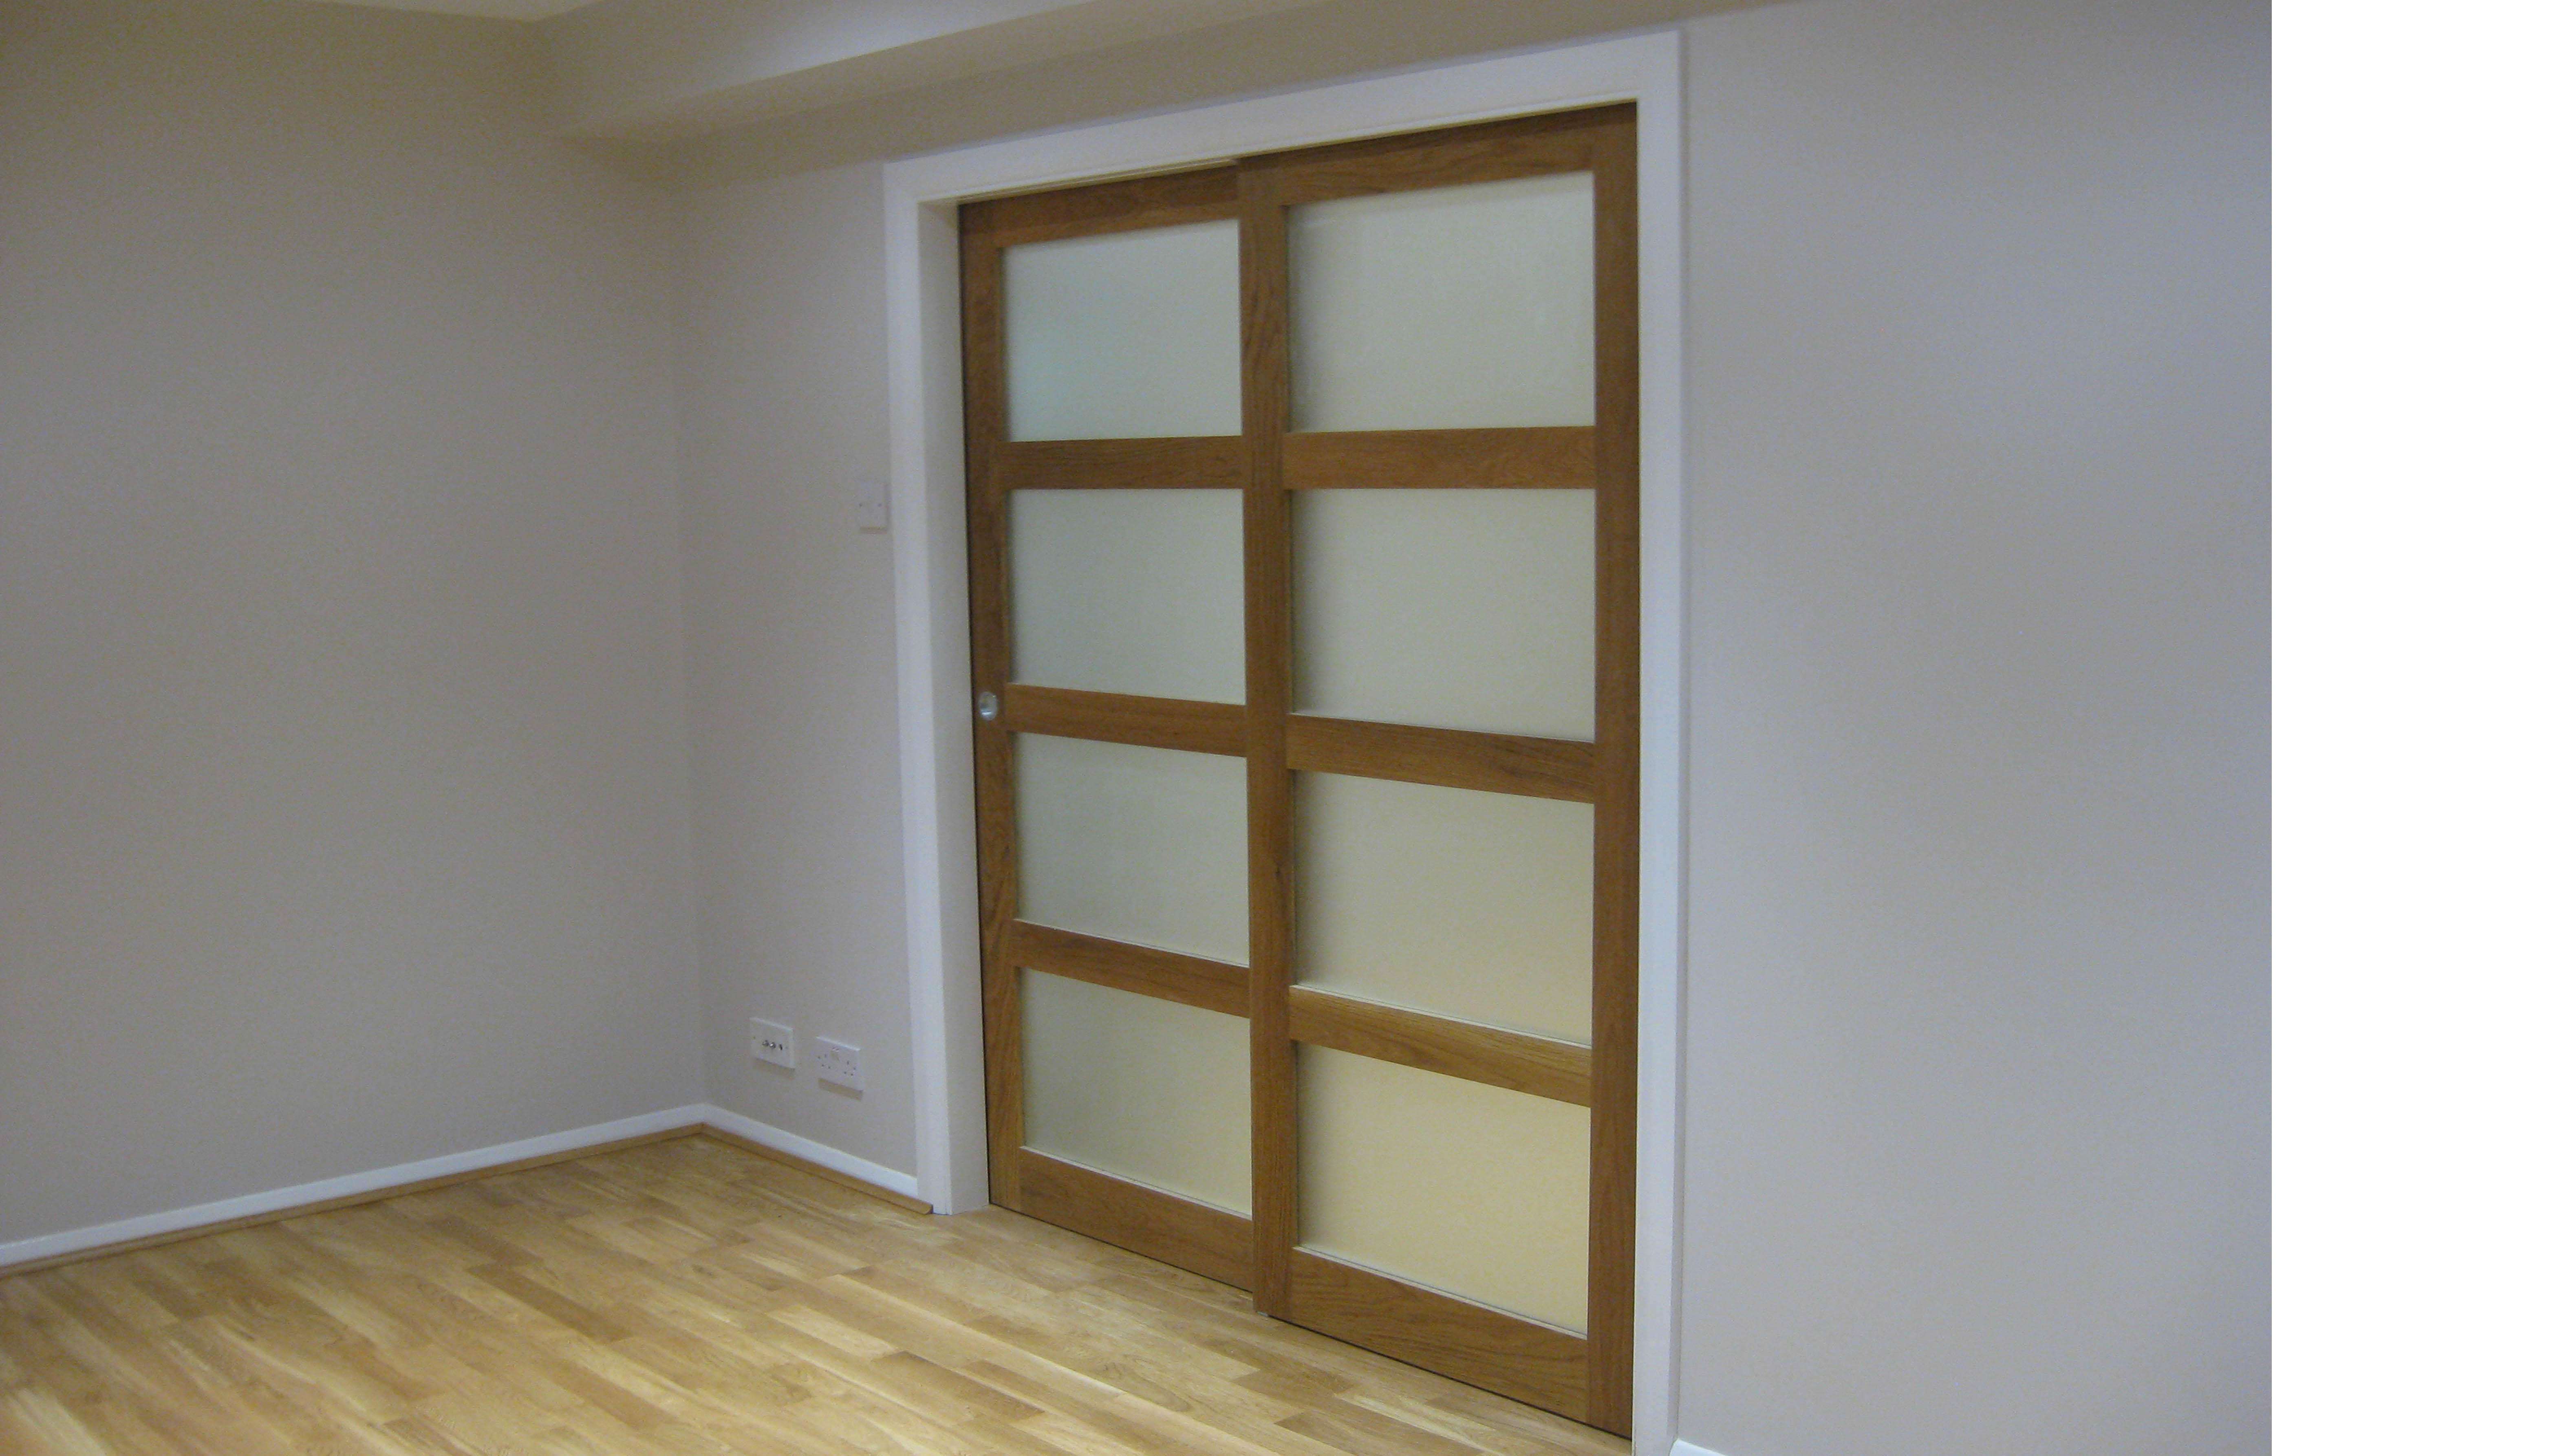 replacement of sliding interior exterior size with glass pocket doors patio full door decorative glazed